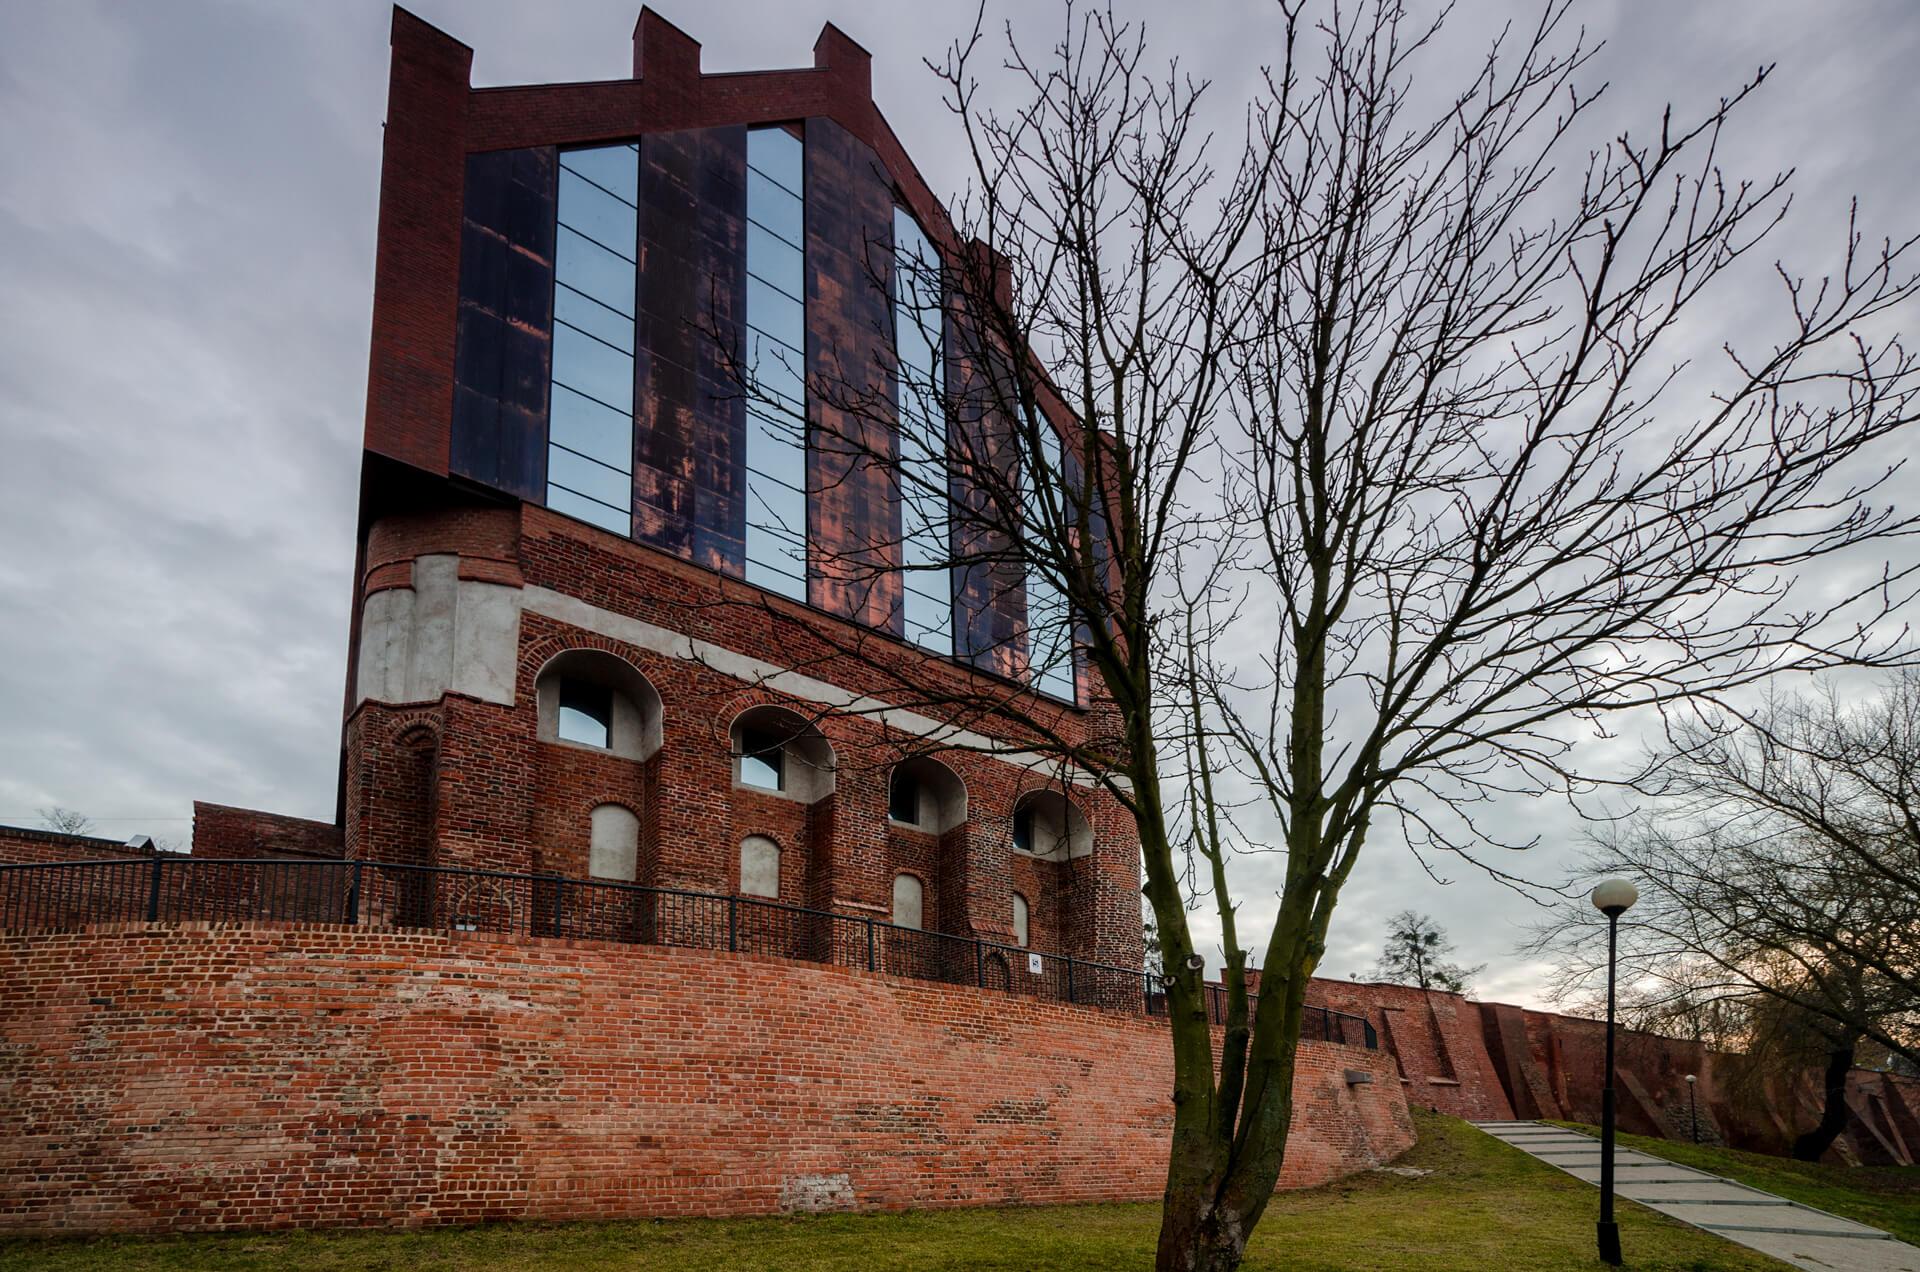 Zamek wMalborku